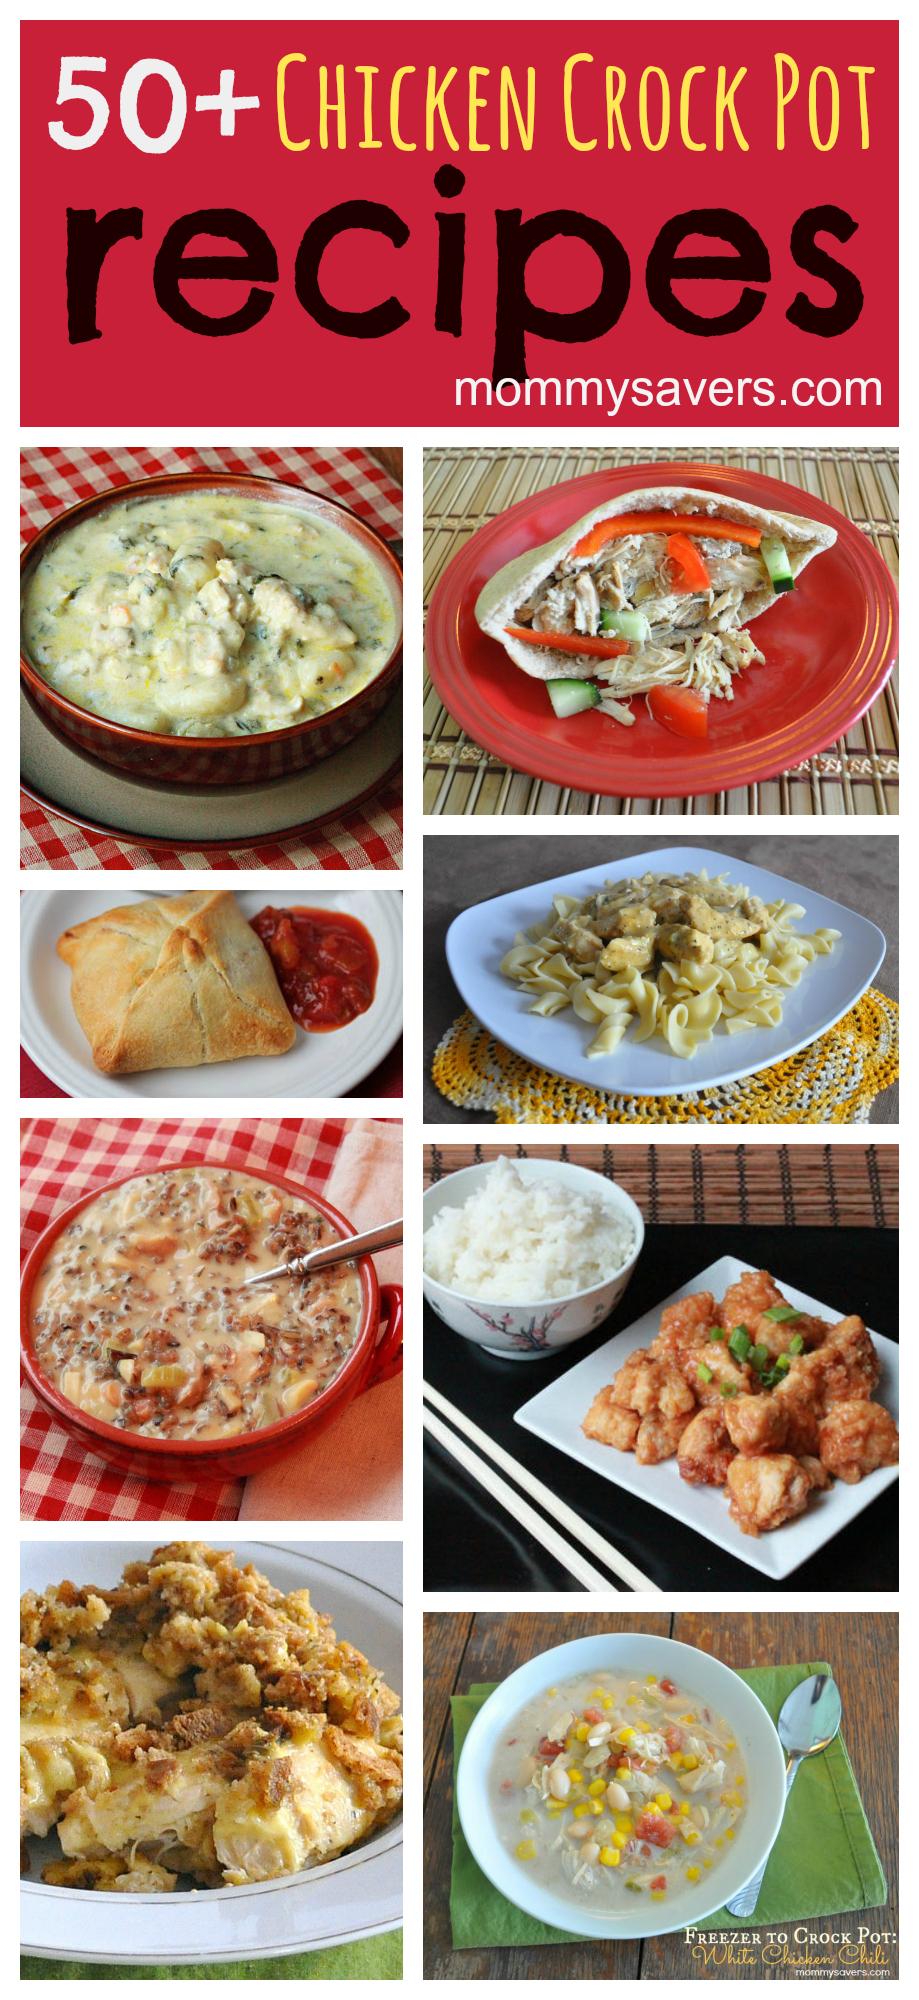 Easy Chicken Crock Pot Recipes